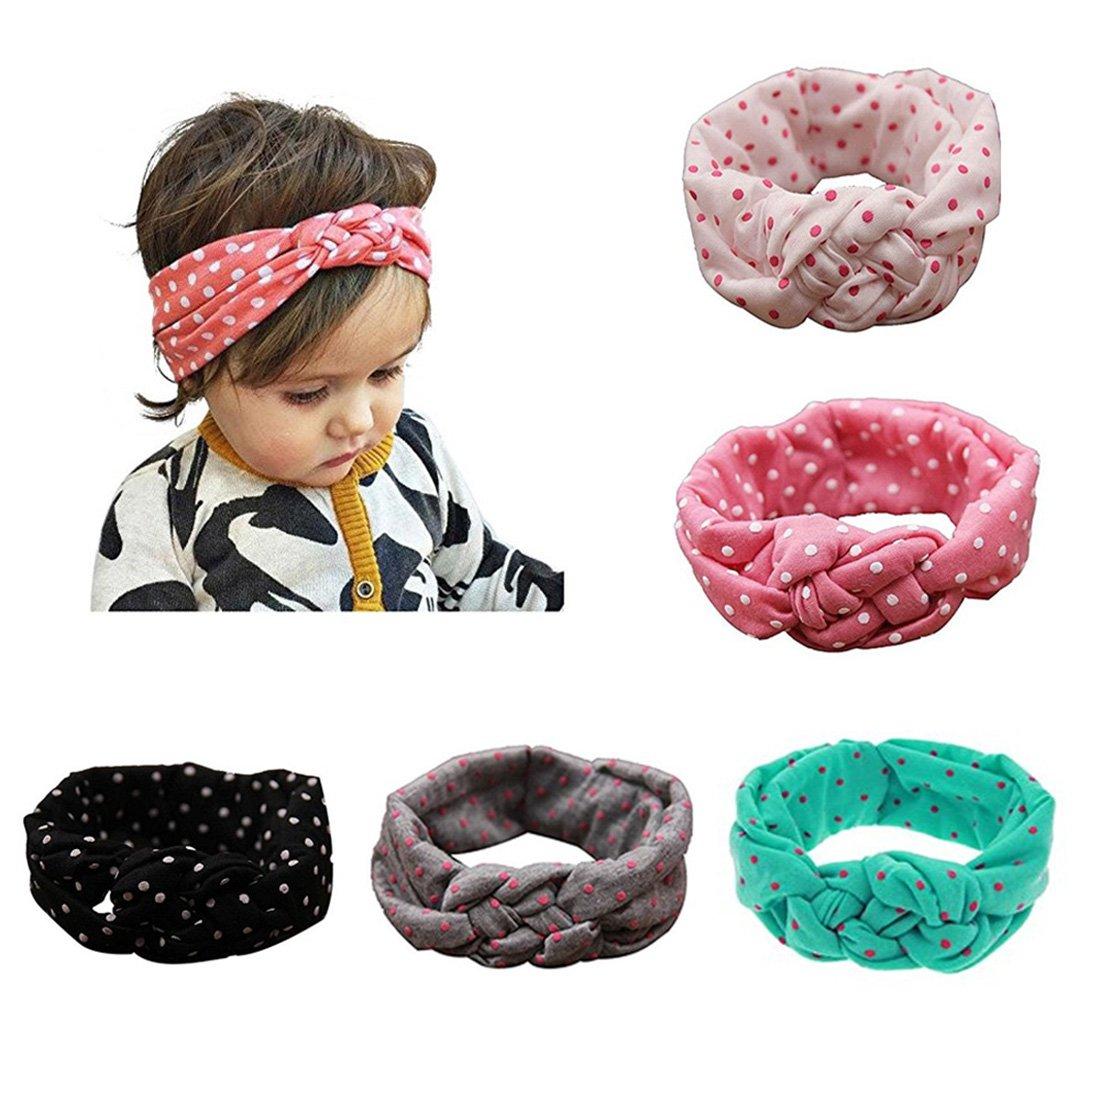 Baby Girl Newest Turban Headband Head Wrap Knotted Hair Band 5 pcs